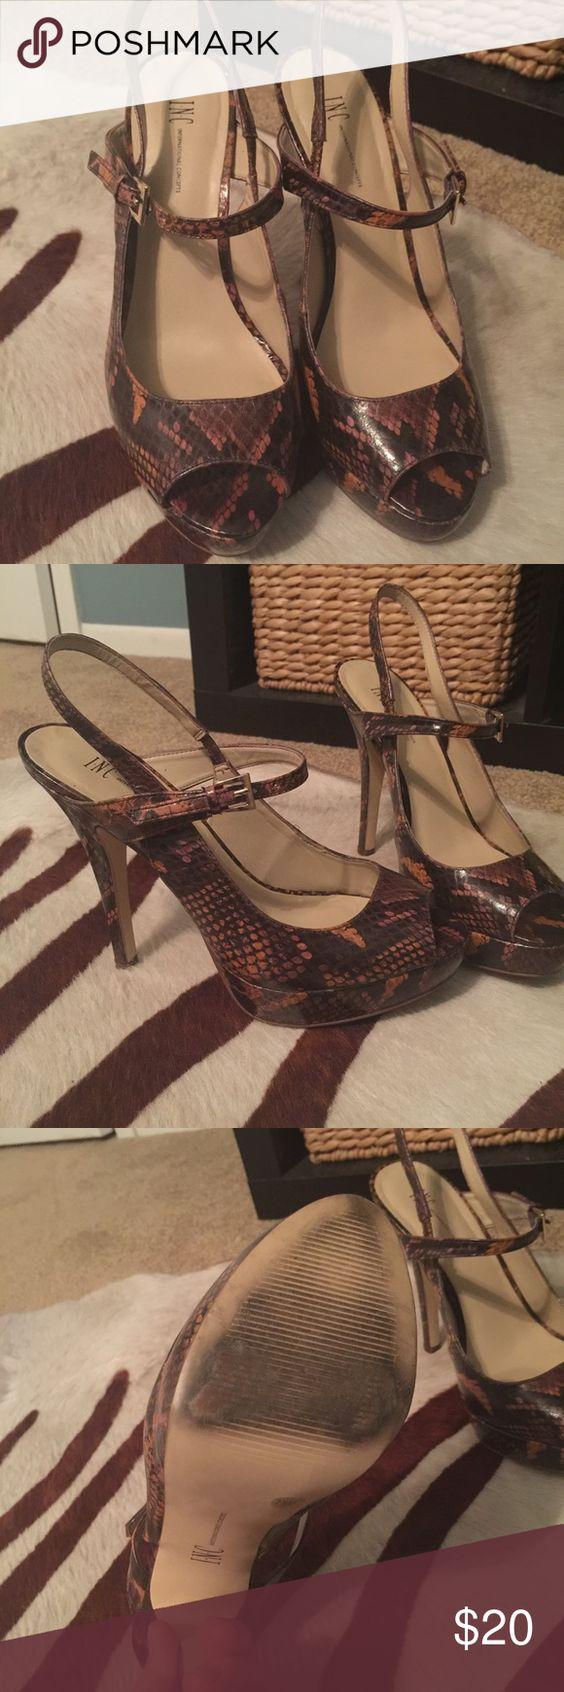 INC Snakeskin Slingback Platforms Peep toe platforms. Sexy! Snakeskin multi-color- Brown, orange and pink. Perfect condition. INC International Concepts Shoes Platforms